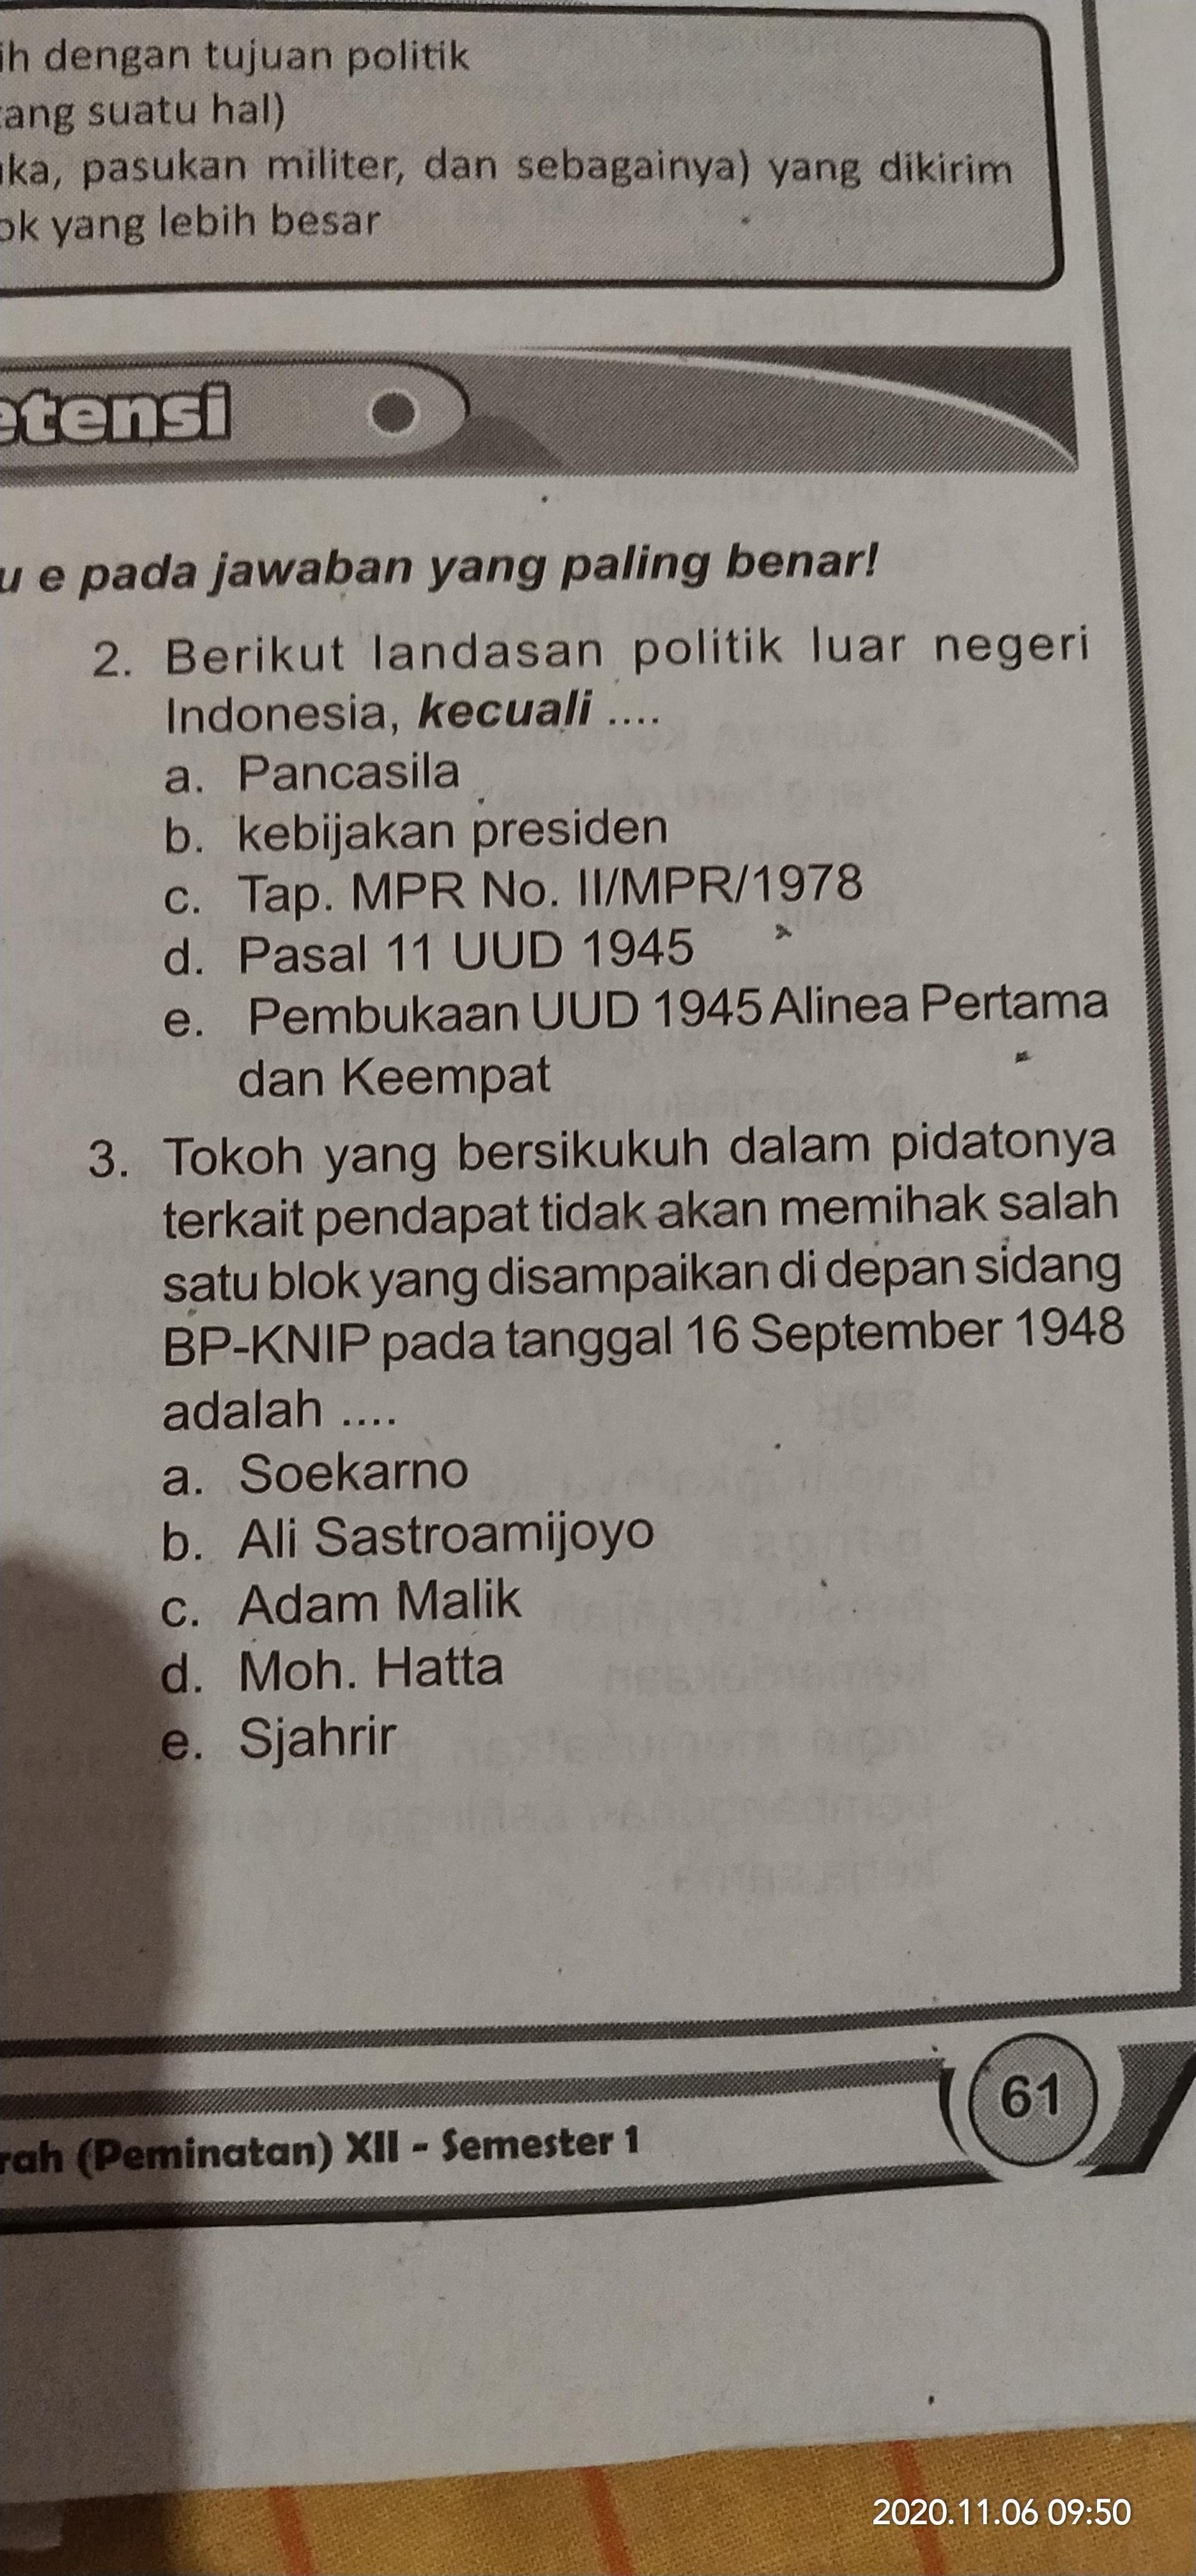 Landasan Politik Luar Negeri Indonesia : landasan, politik, negeri, indonesia, Berikut, Landasan, Politik, Negeri, Indonesia,, Kecuali, Brainly.co.id